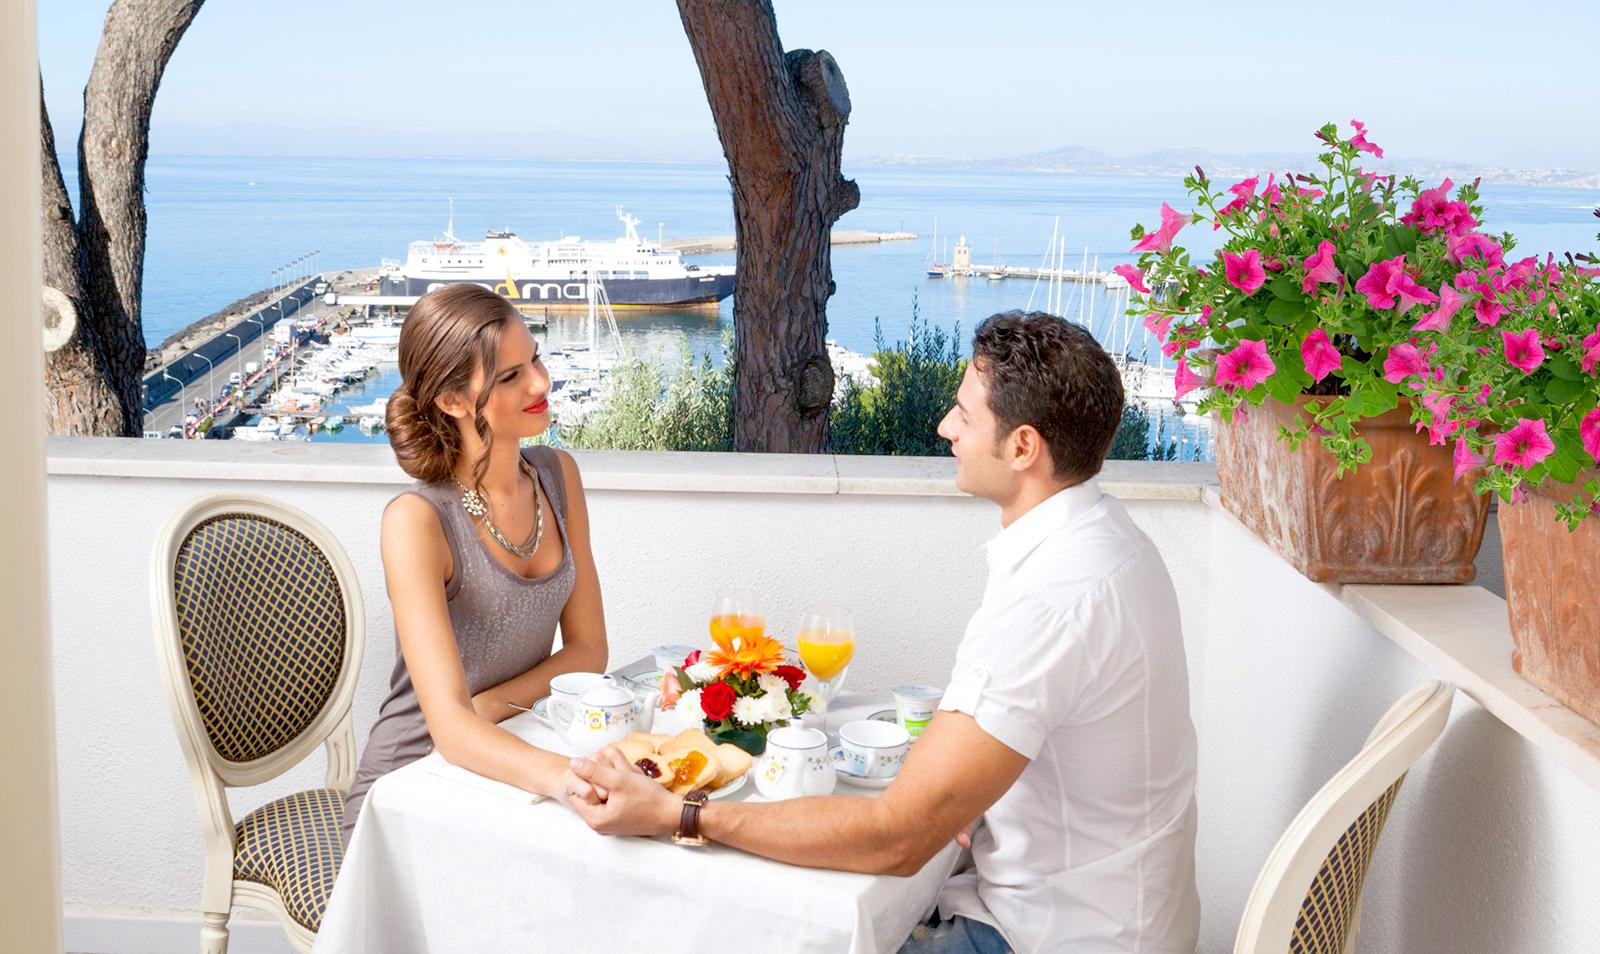 hotel-terme-gran-paradiso-ischia-casamicciola-camera-balcone-vista-mare